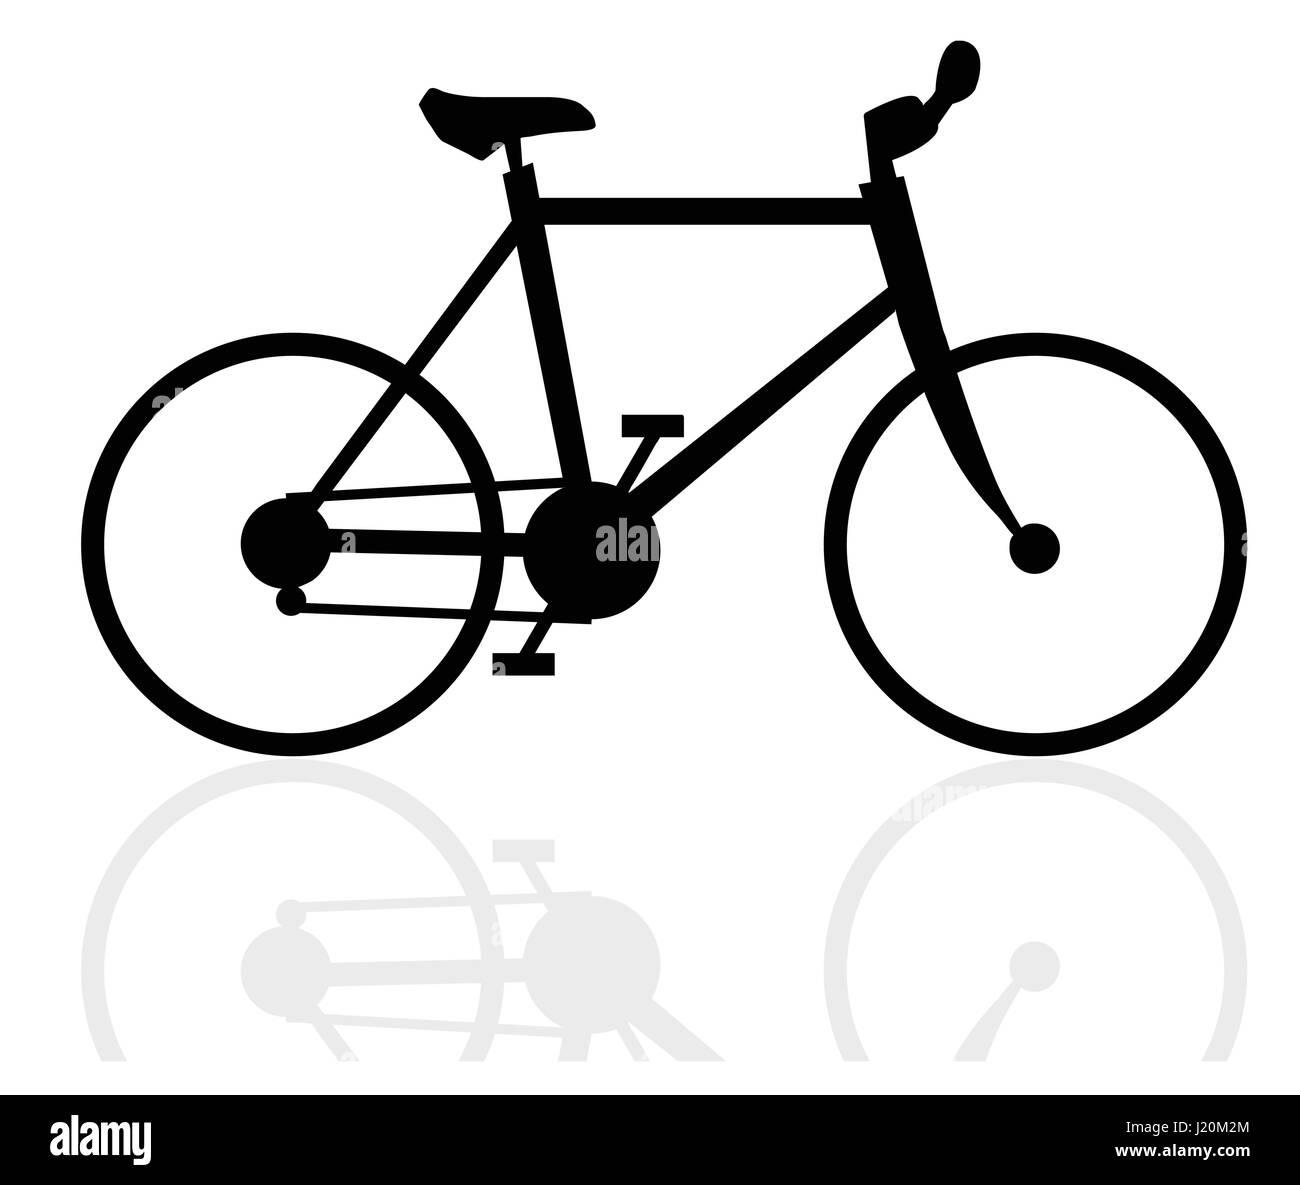 EPS 10 vector illustration of  velocipede on white background - Stock Image